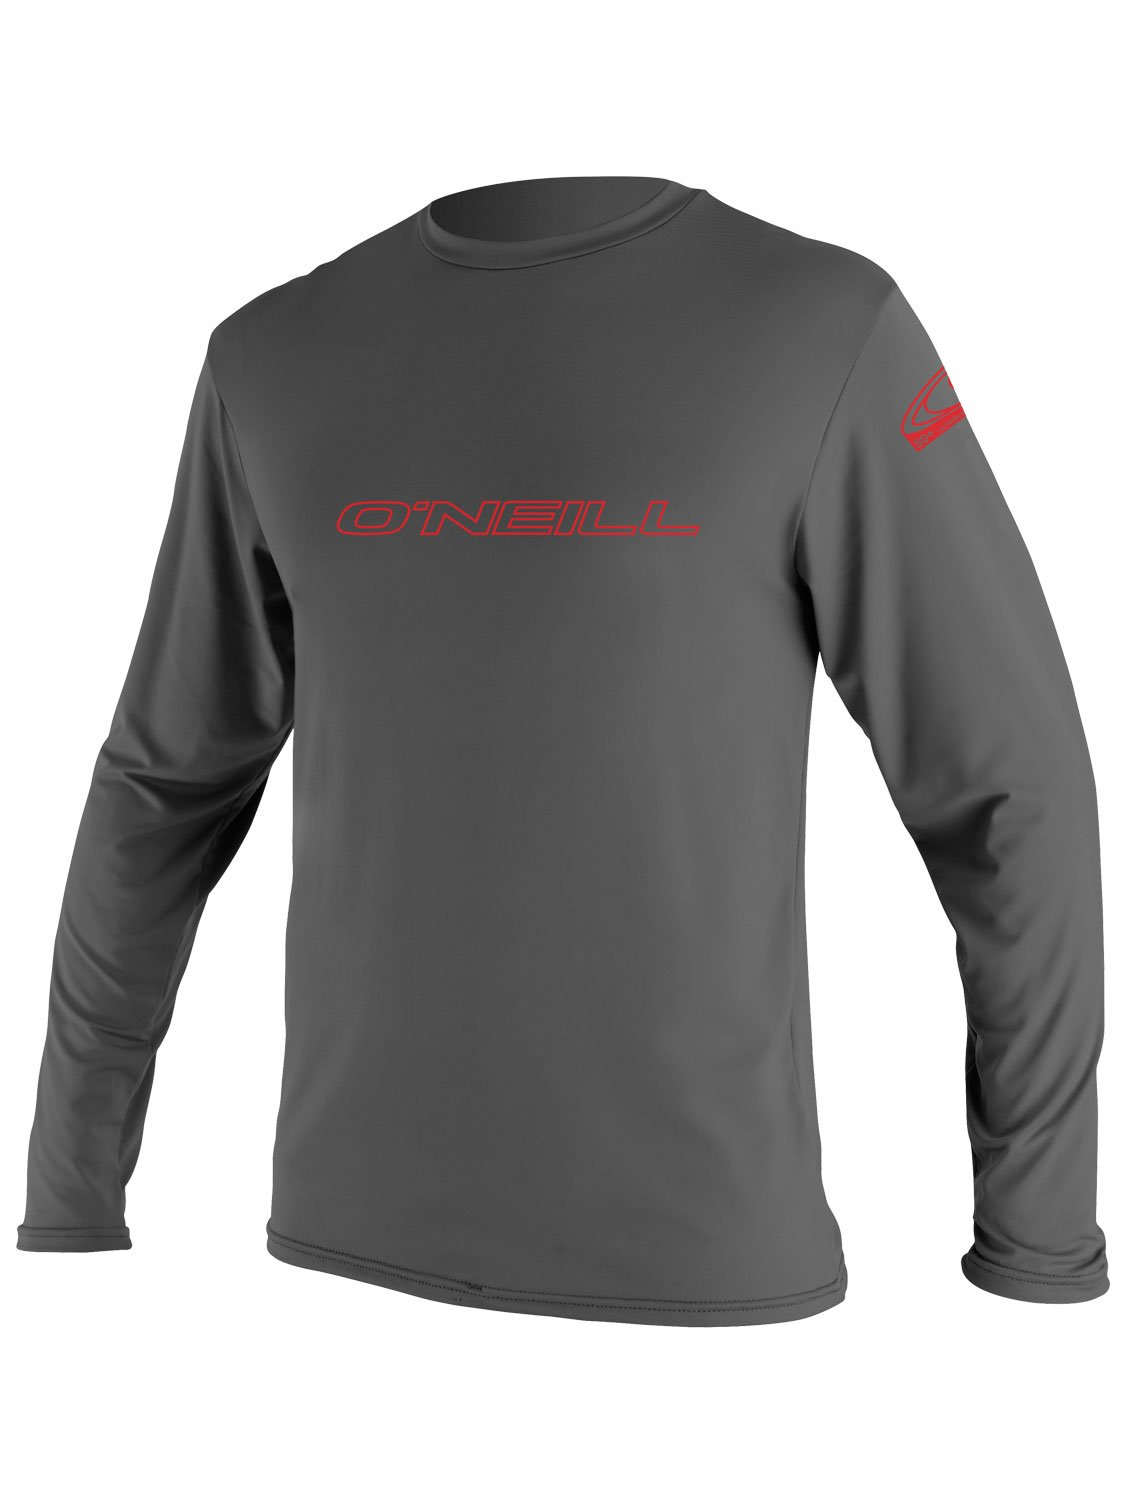 O'Neill Youth Basic Skins UPF 50+ Long Sleeve Sun Shirt, Graphite, 4